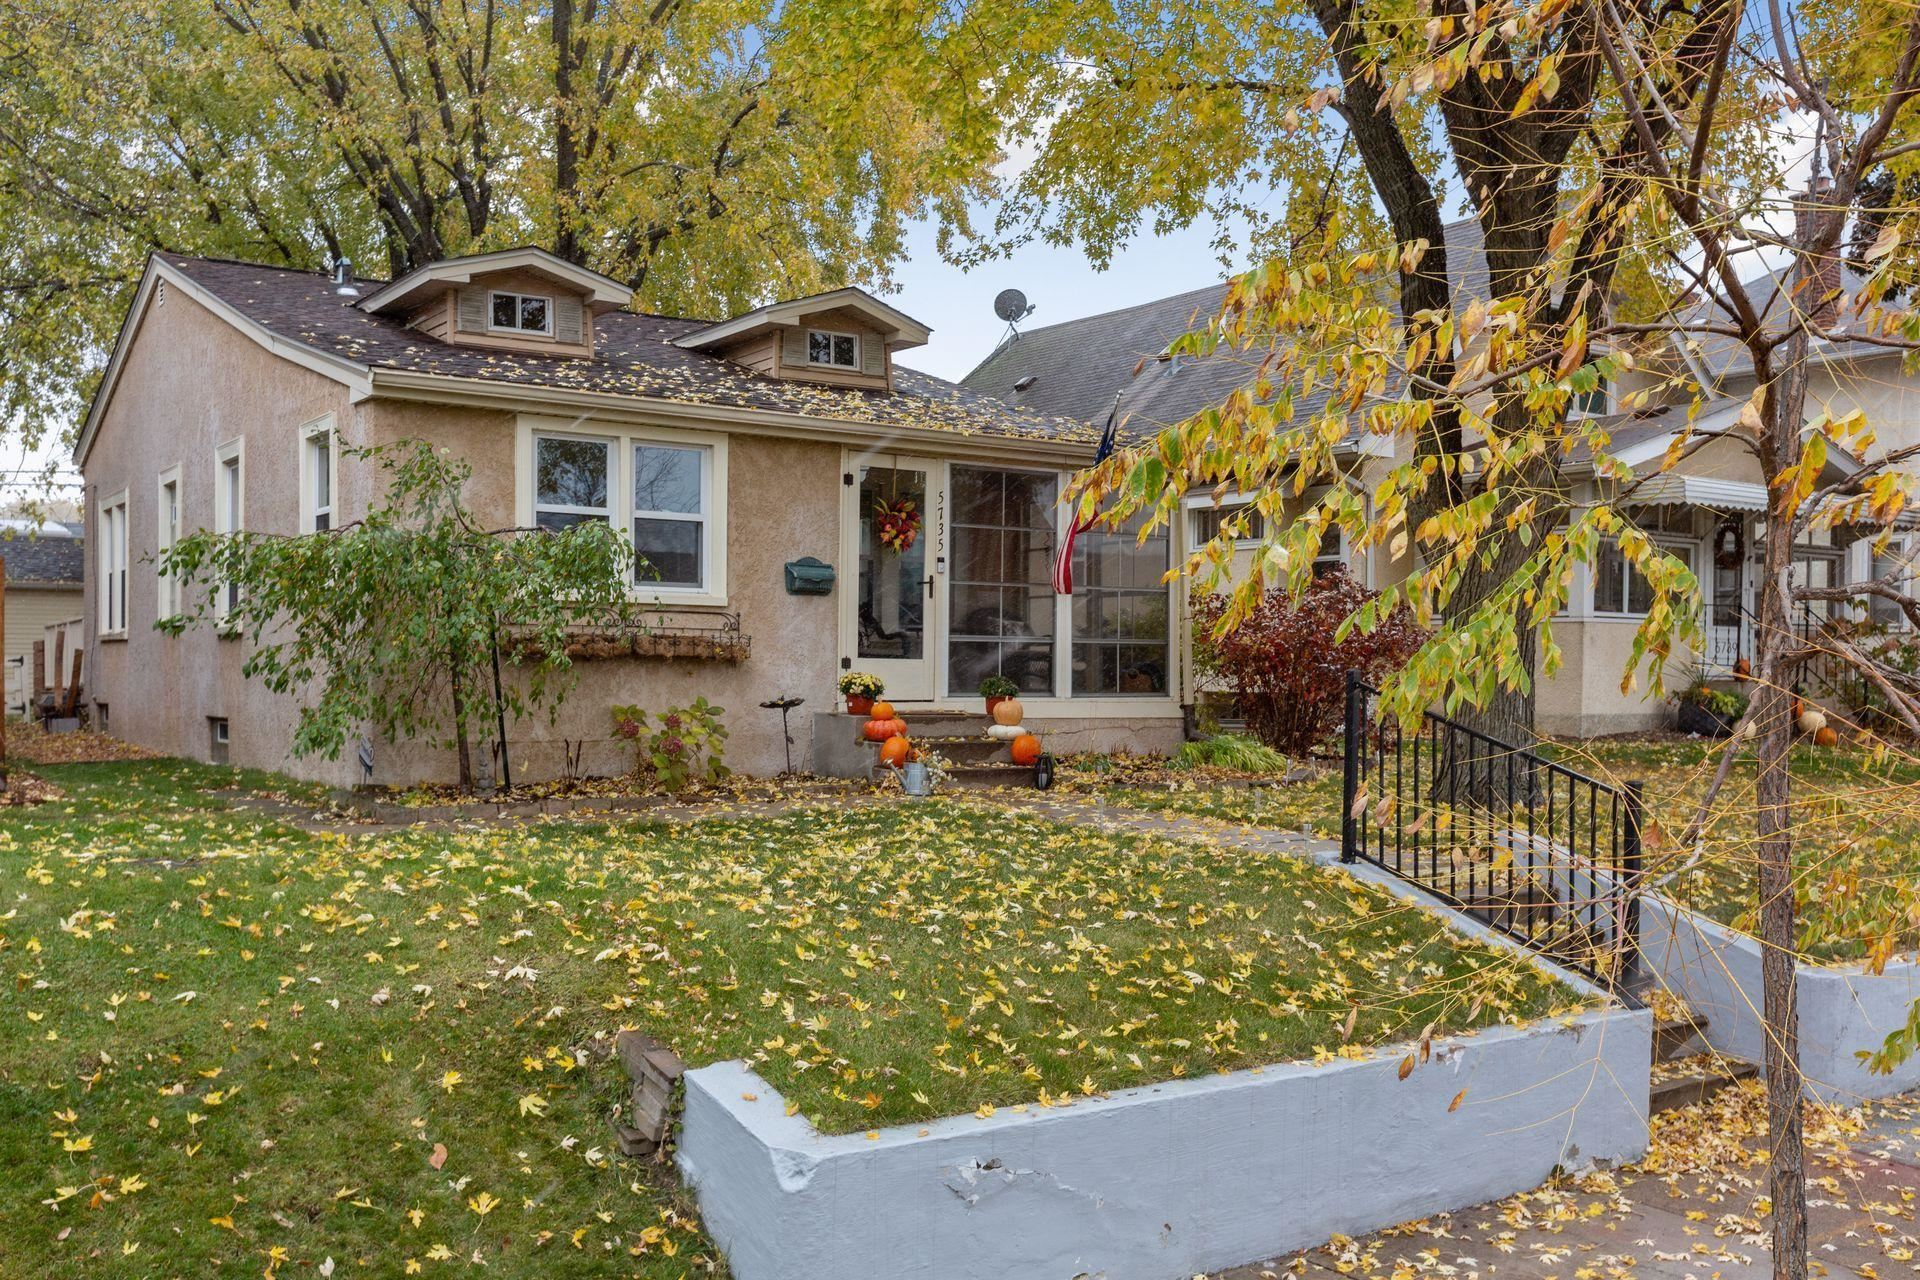 Photo of 5735 Garfield Avenue, Minneapolis, MN 55419 (MLS # 6028346)